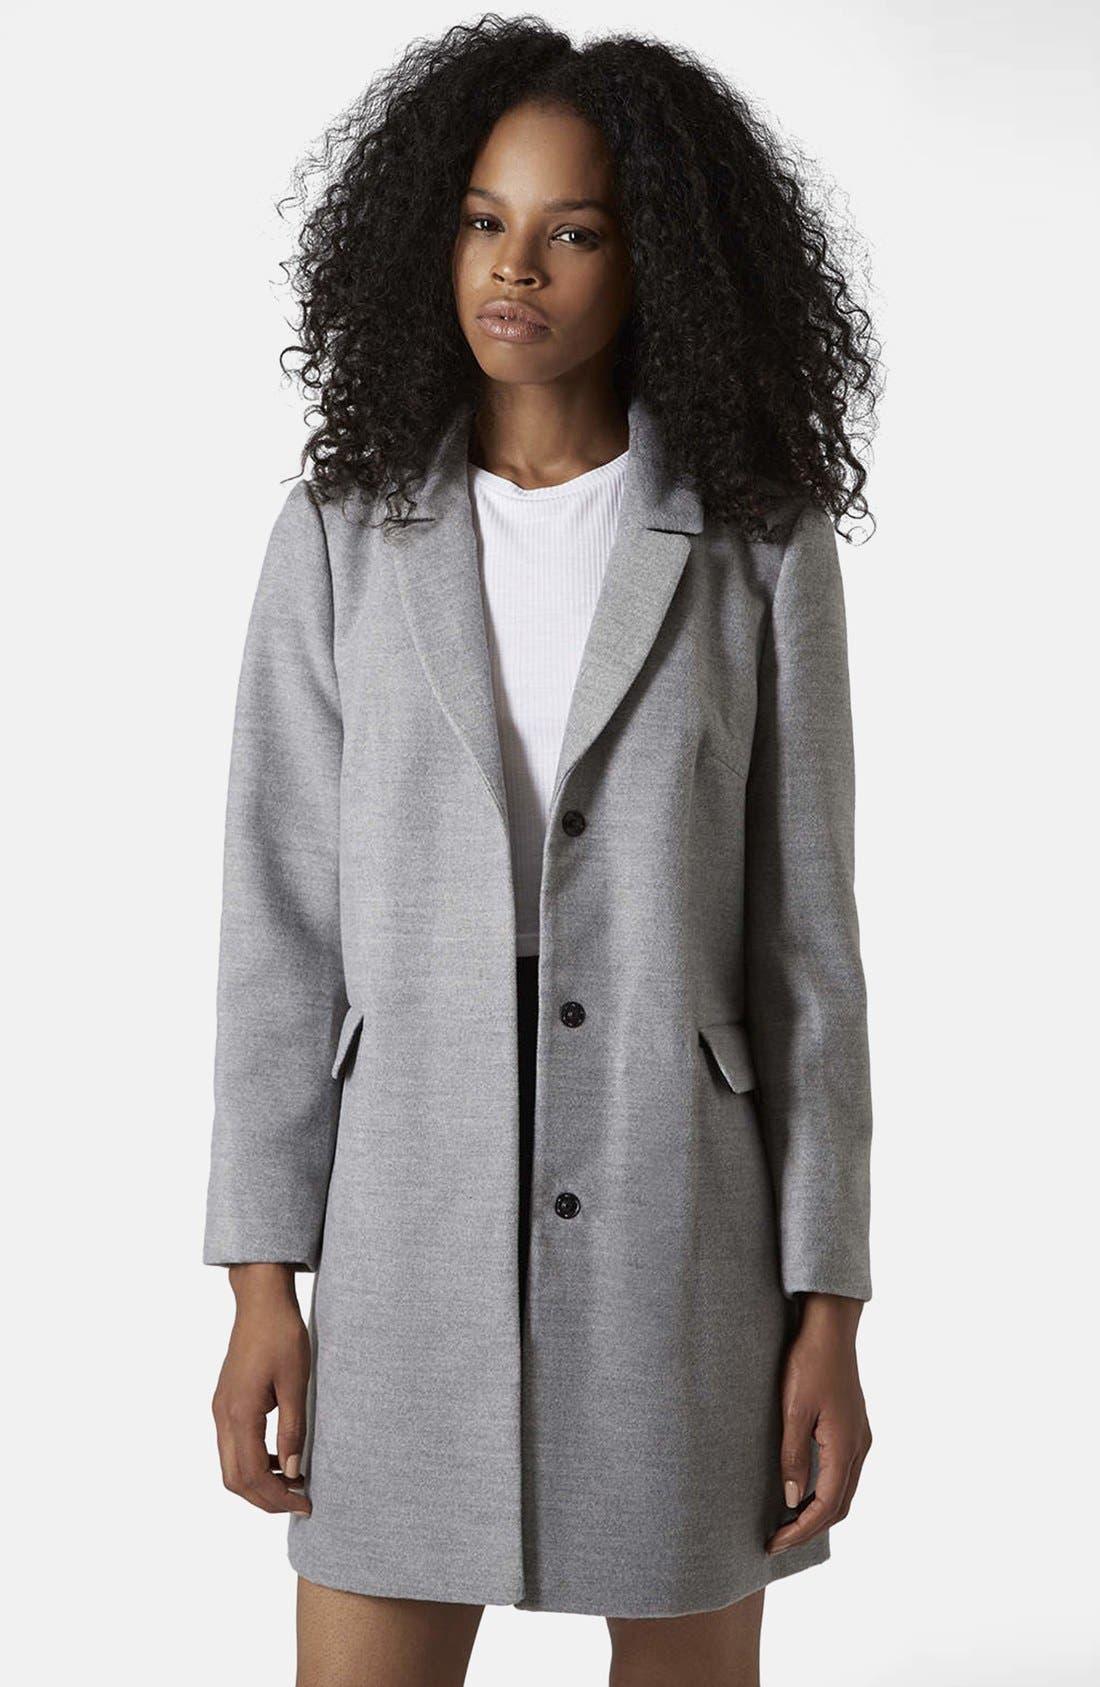 Alternate Image 1 Selected - Topshop 'Maisie' Slim Brushed Coat